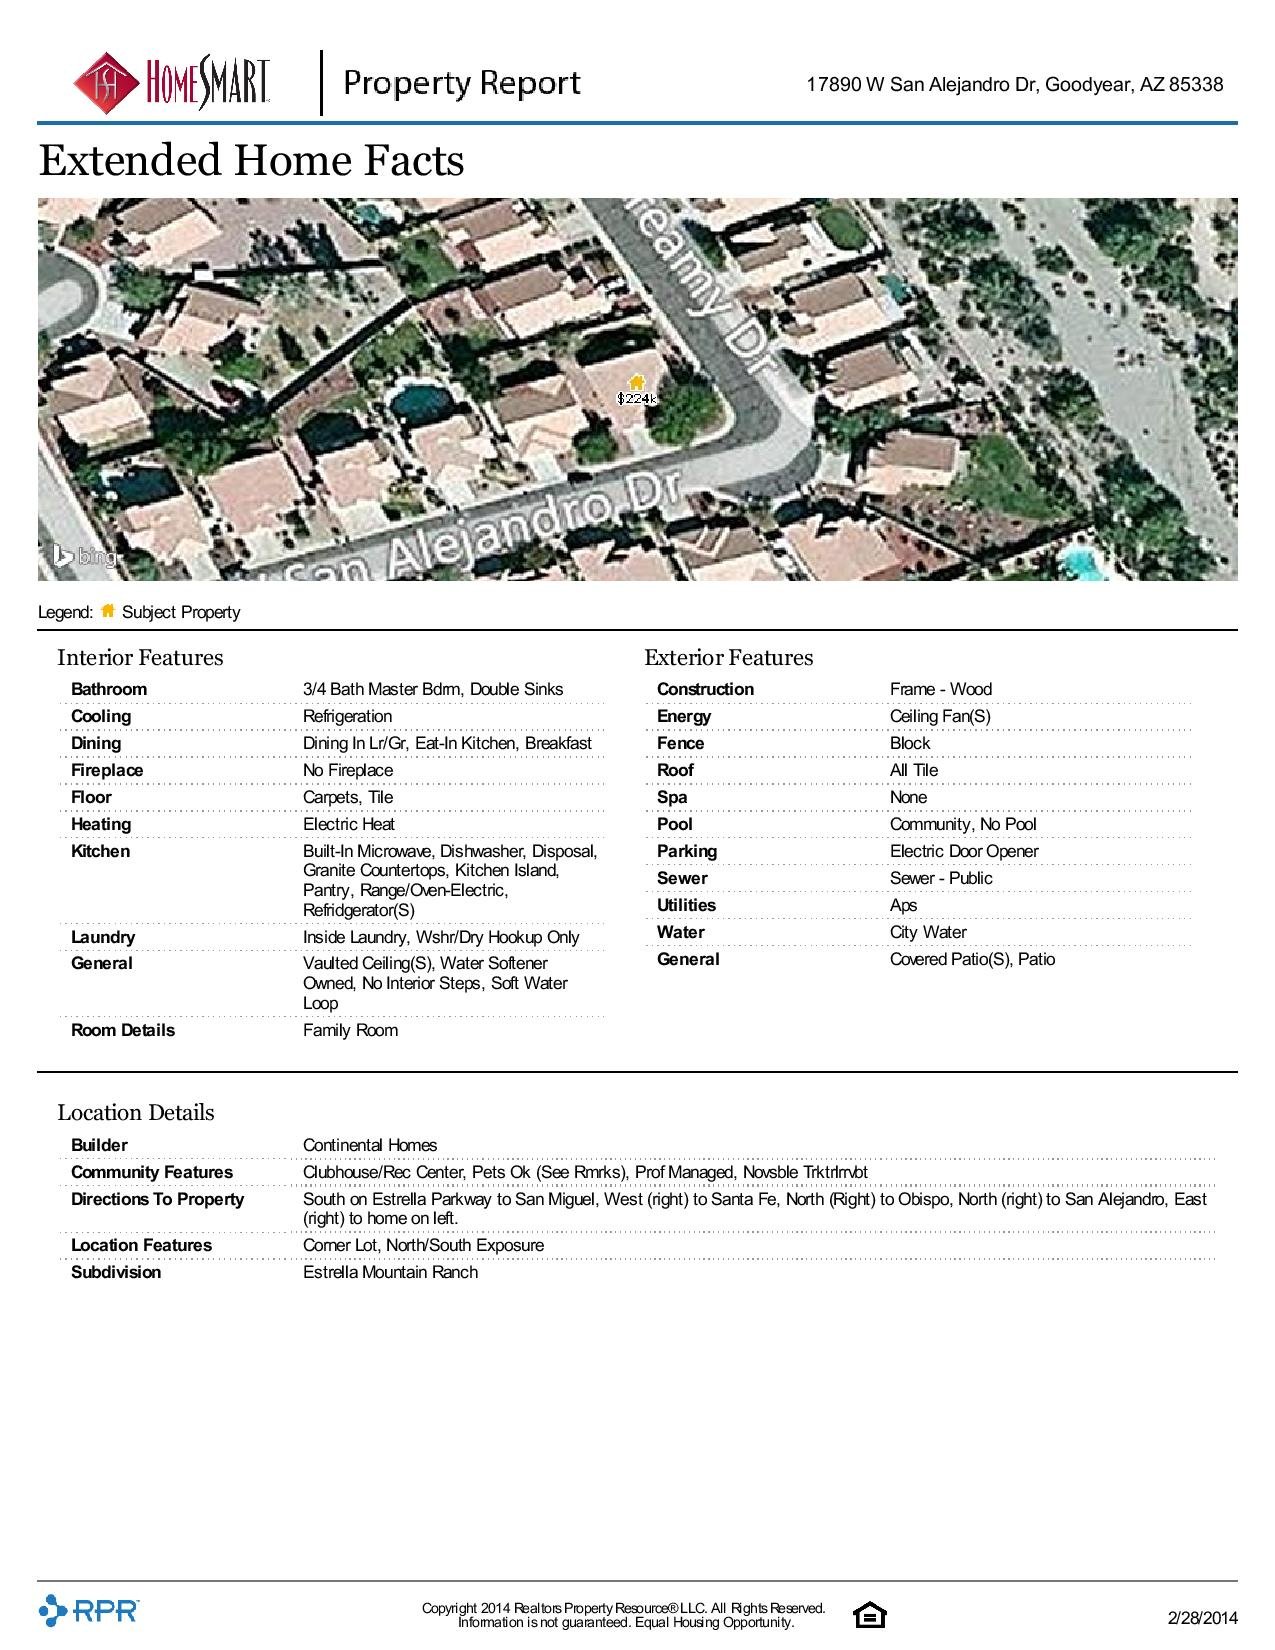 17890-W-San-Alejandro-Dr-Goodyear-AZ-85338-page-004